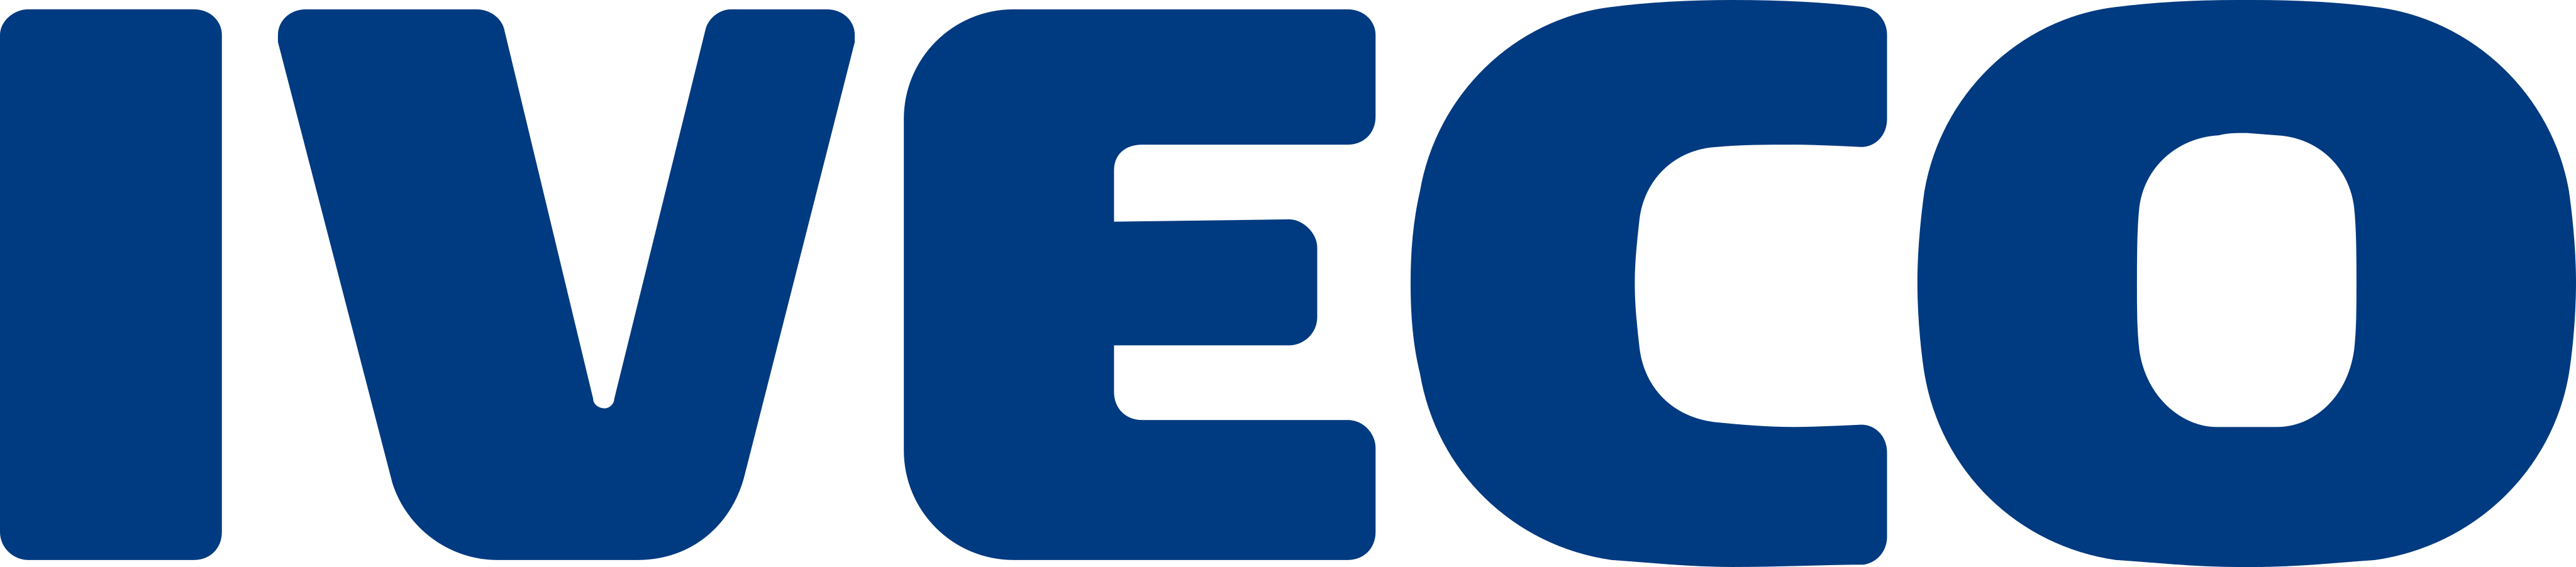 iveco logo 8 - Iveco Logo